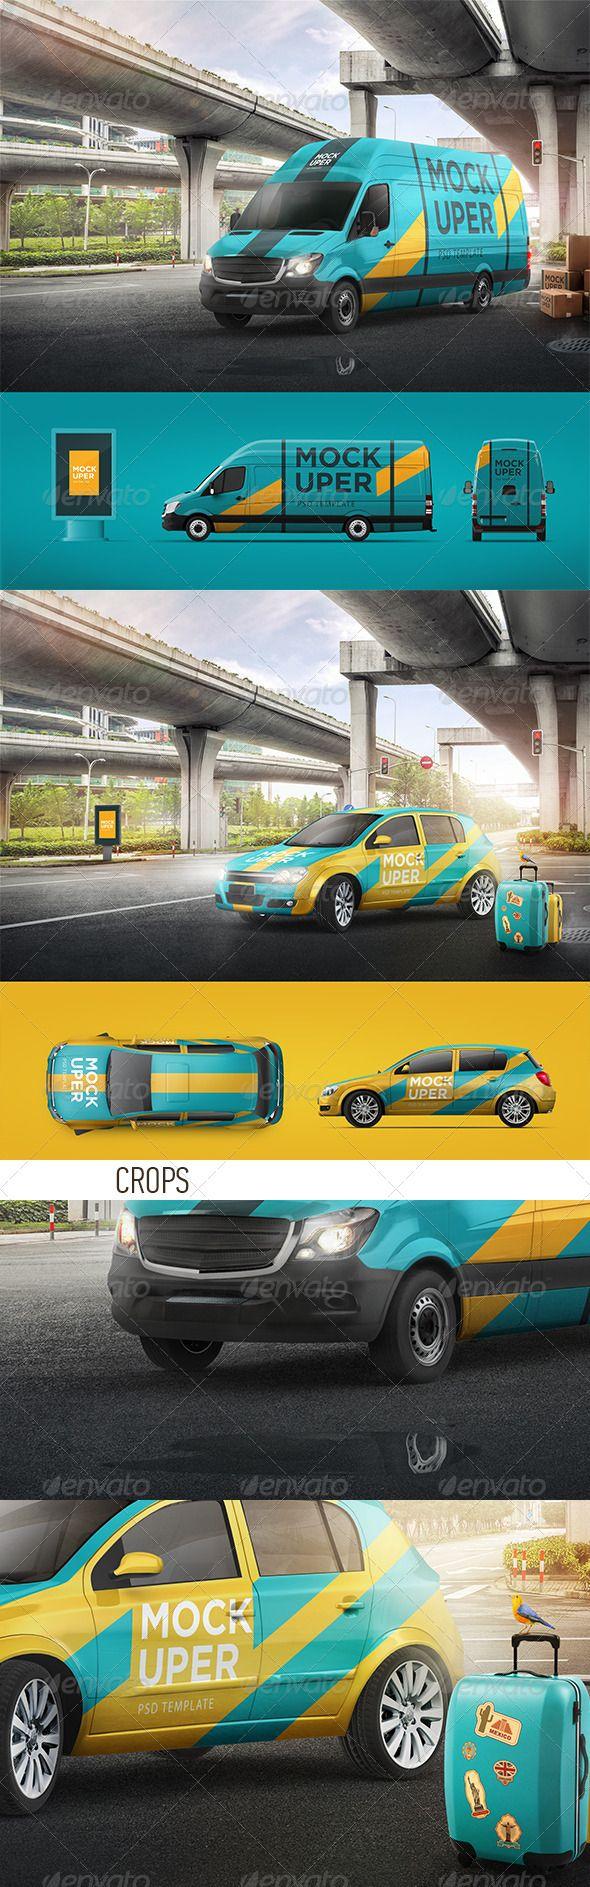 Car sticker design psd - Van Car Mock Ups 2 Psd